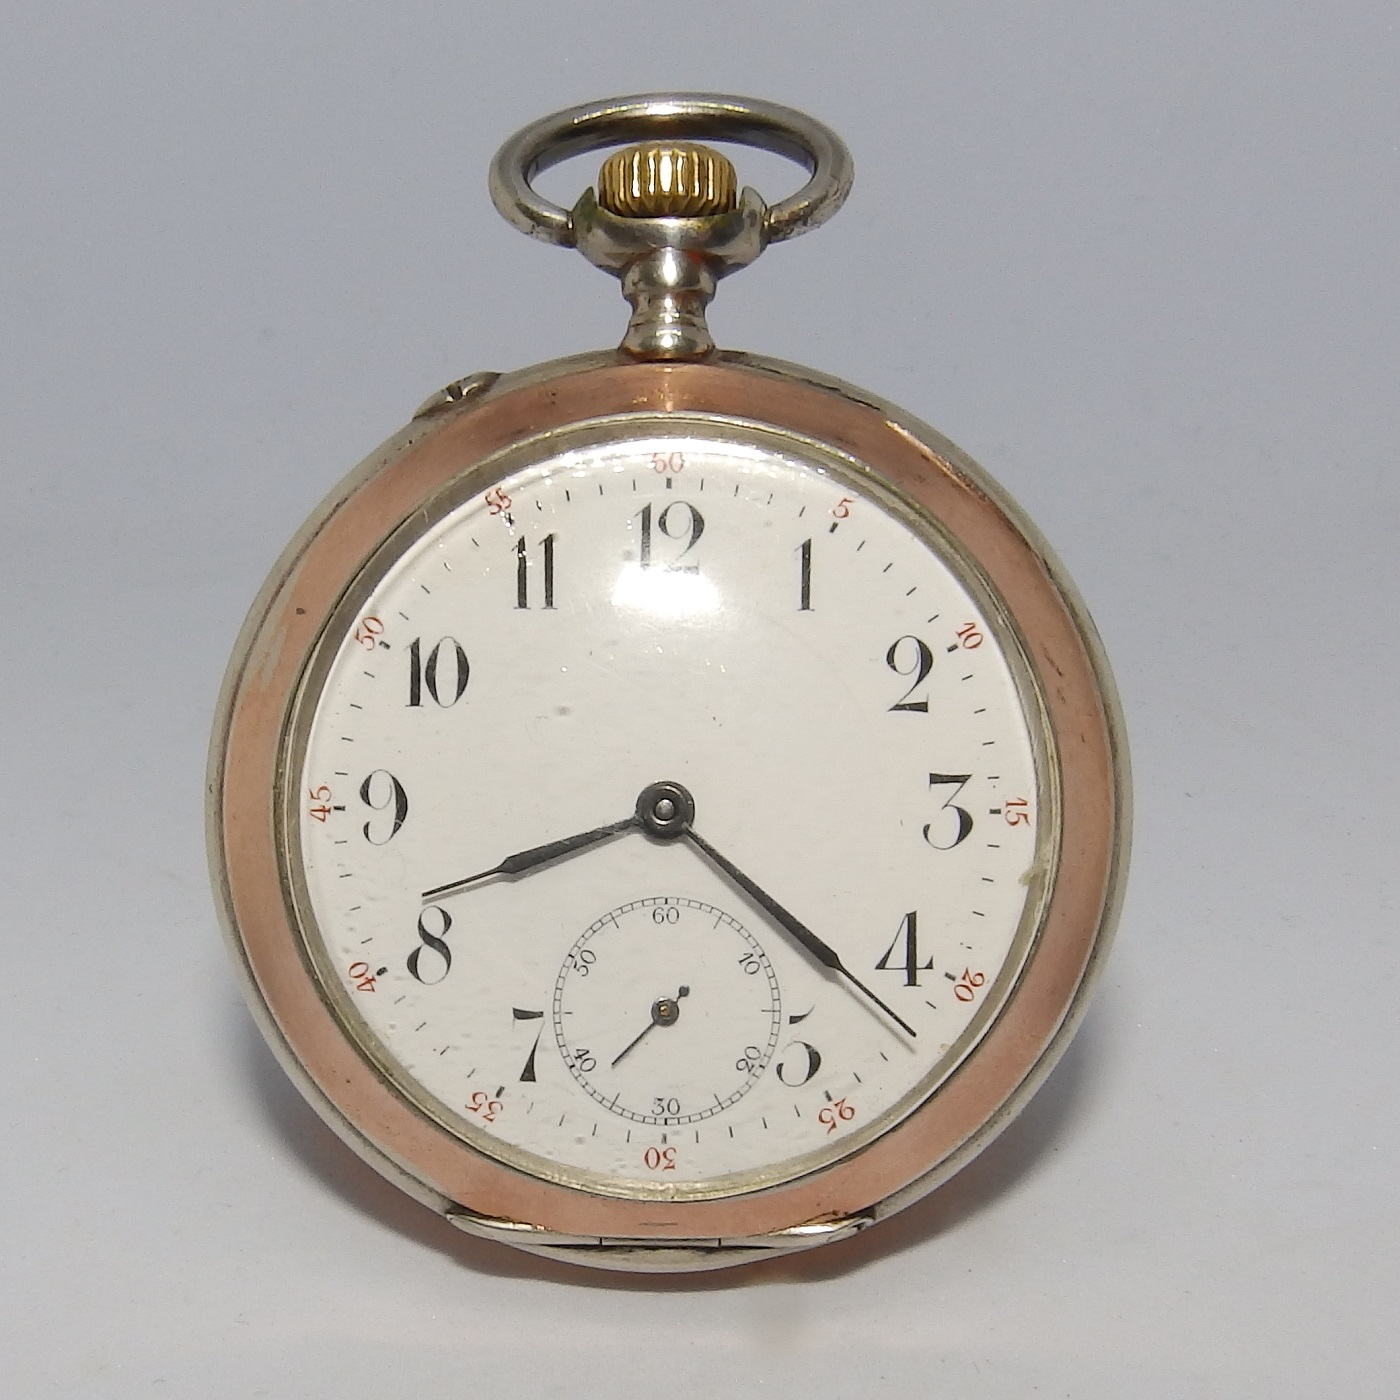 IWC (International Watch Company). Reloj de Bolsillo, Lepine y remontoir. Suiza, año 1907.